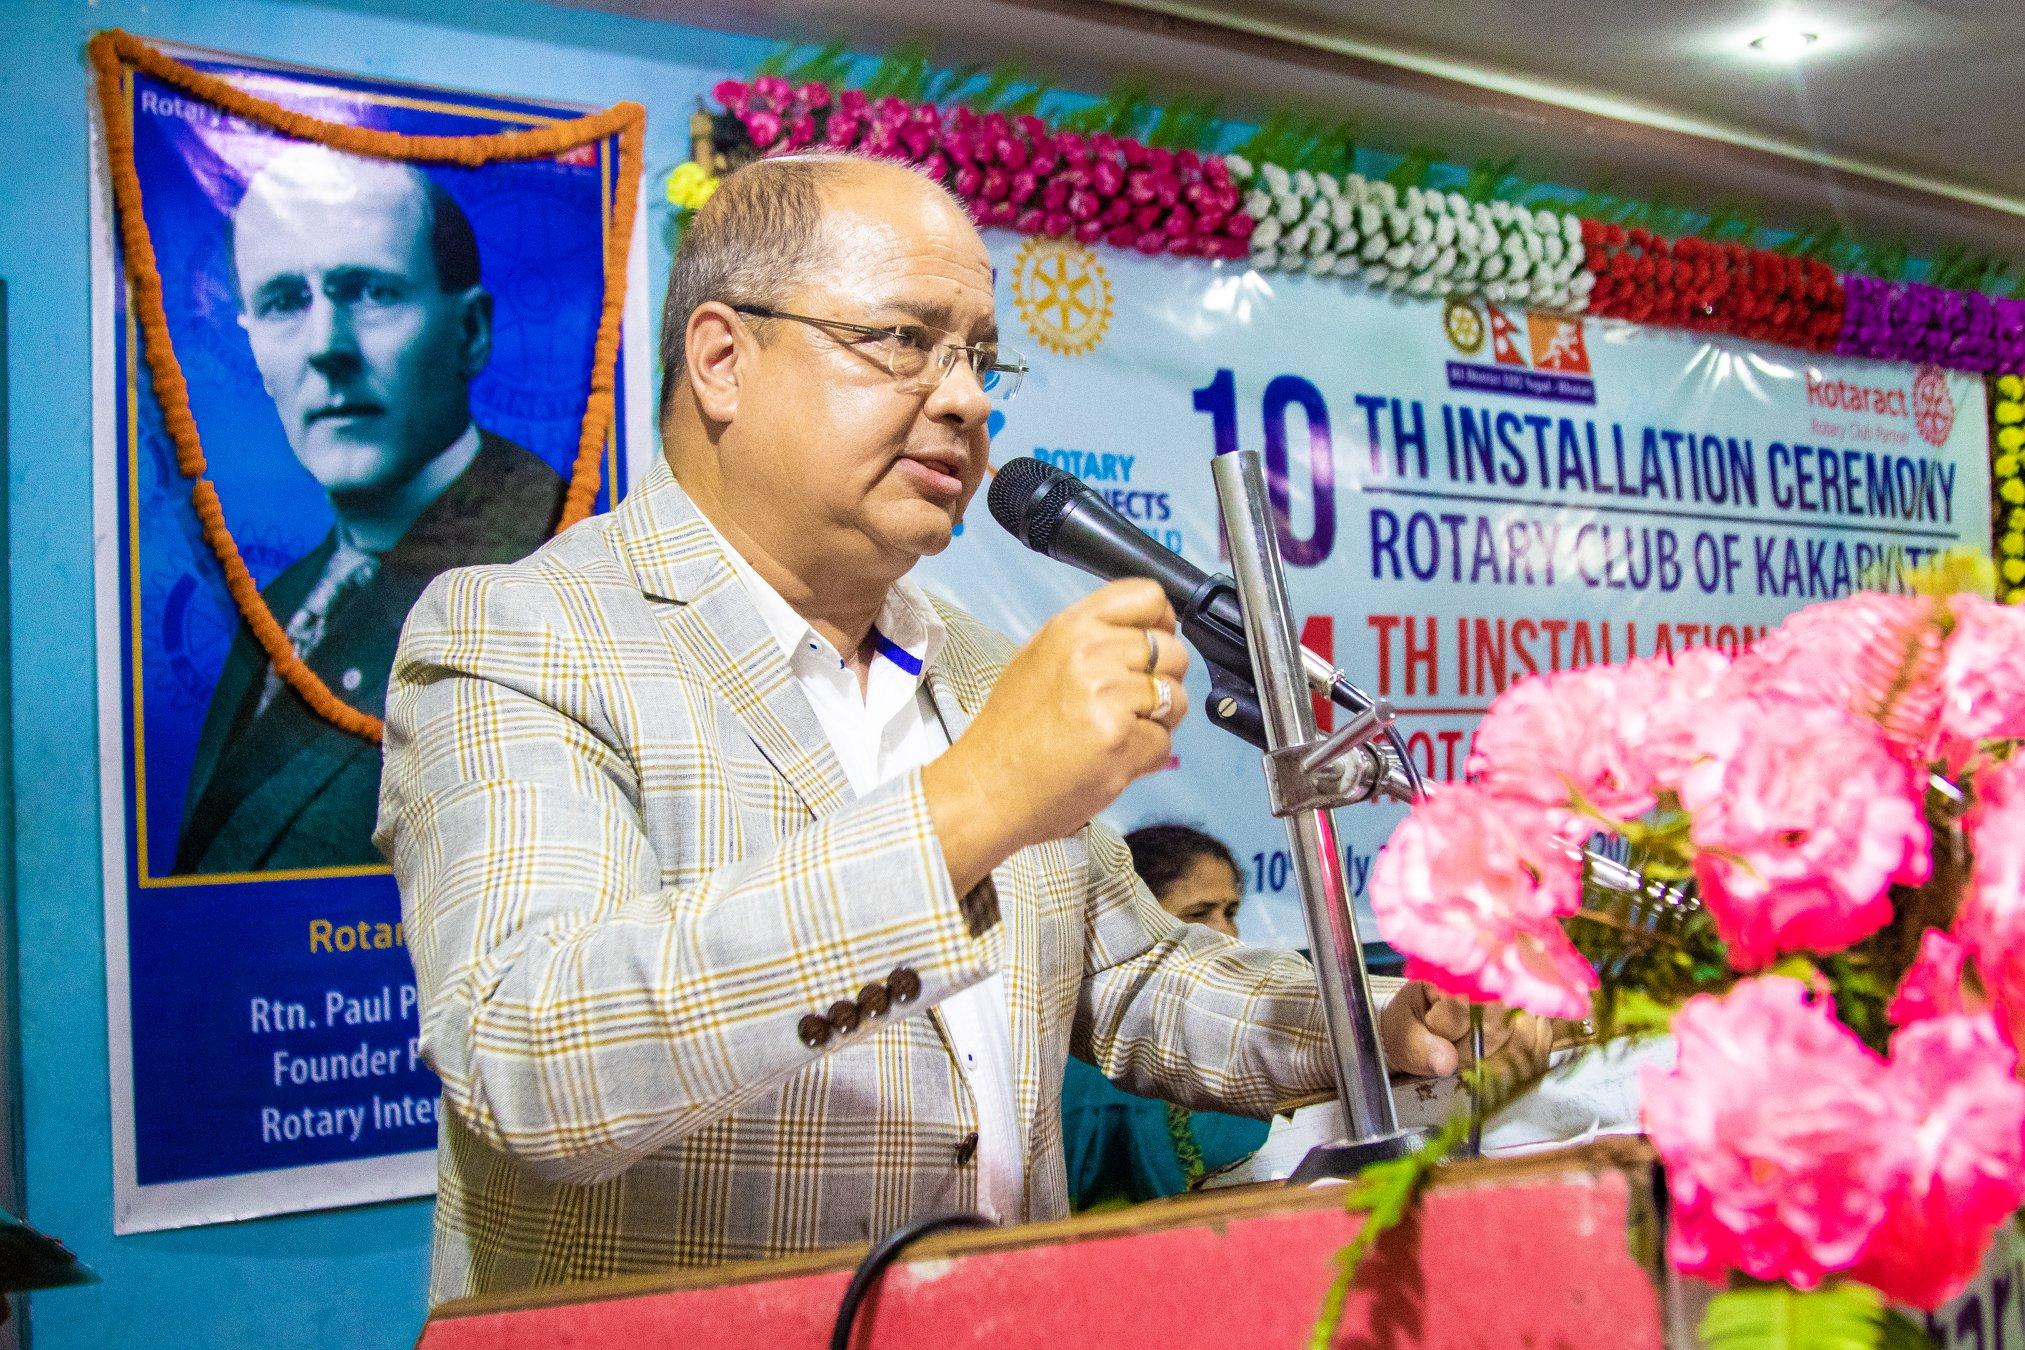 10th Installation Ceremony Rotary Club Of Kakarvitta 48